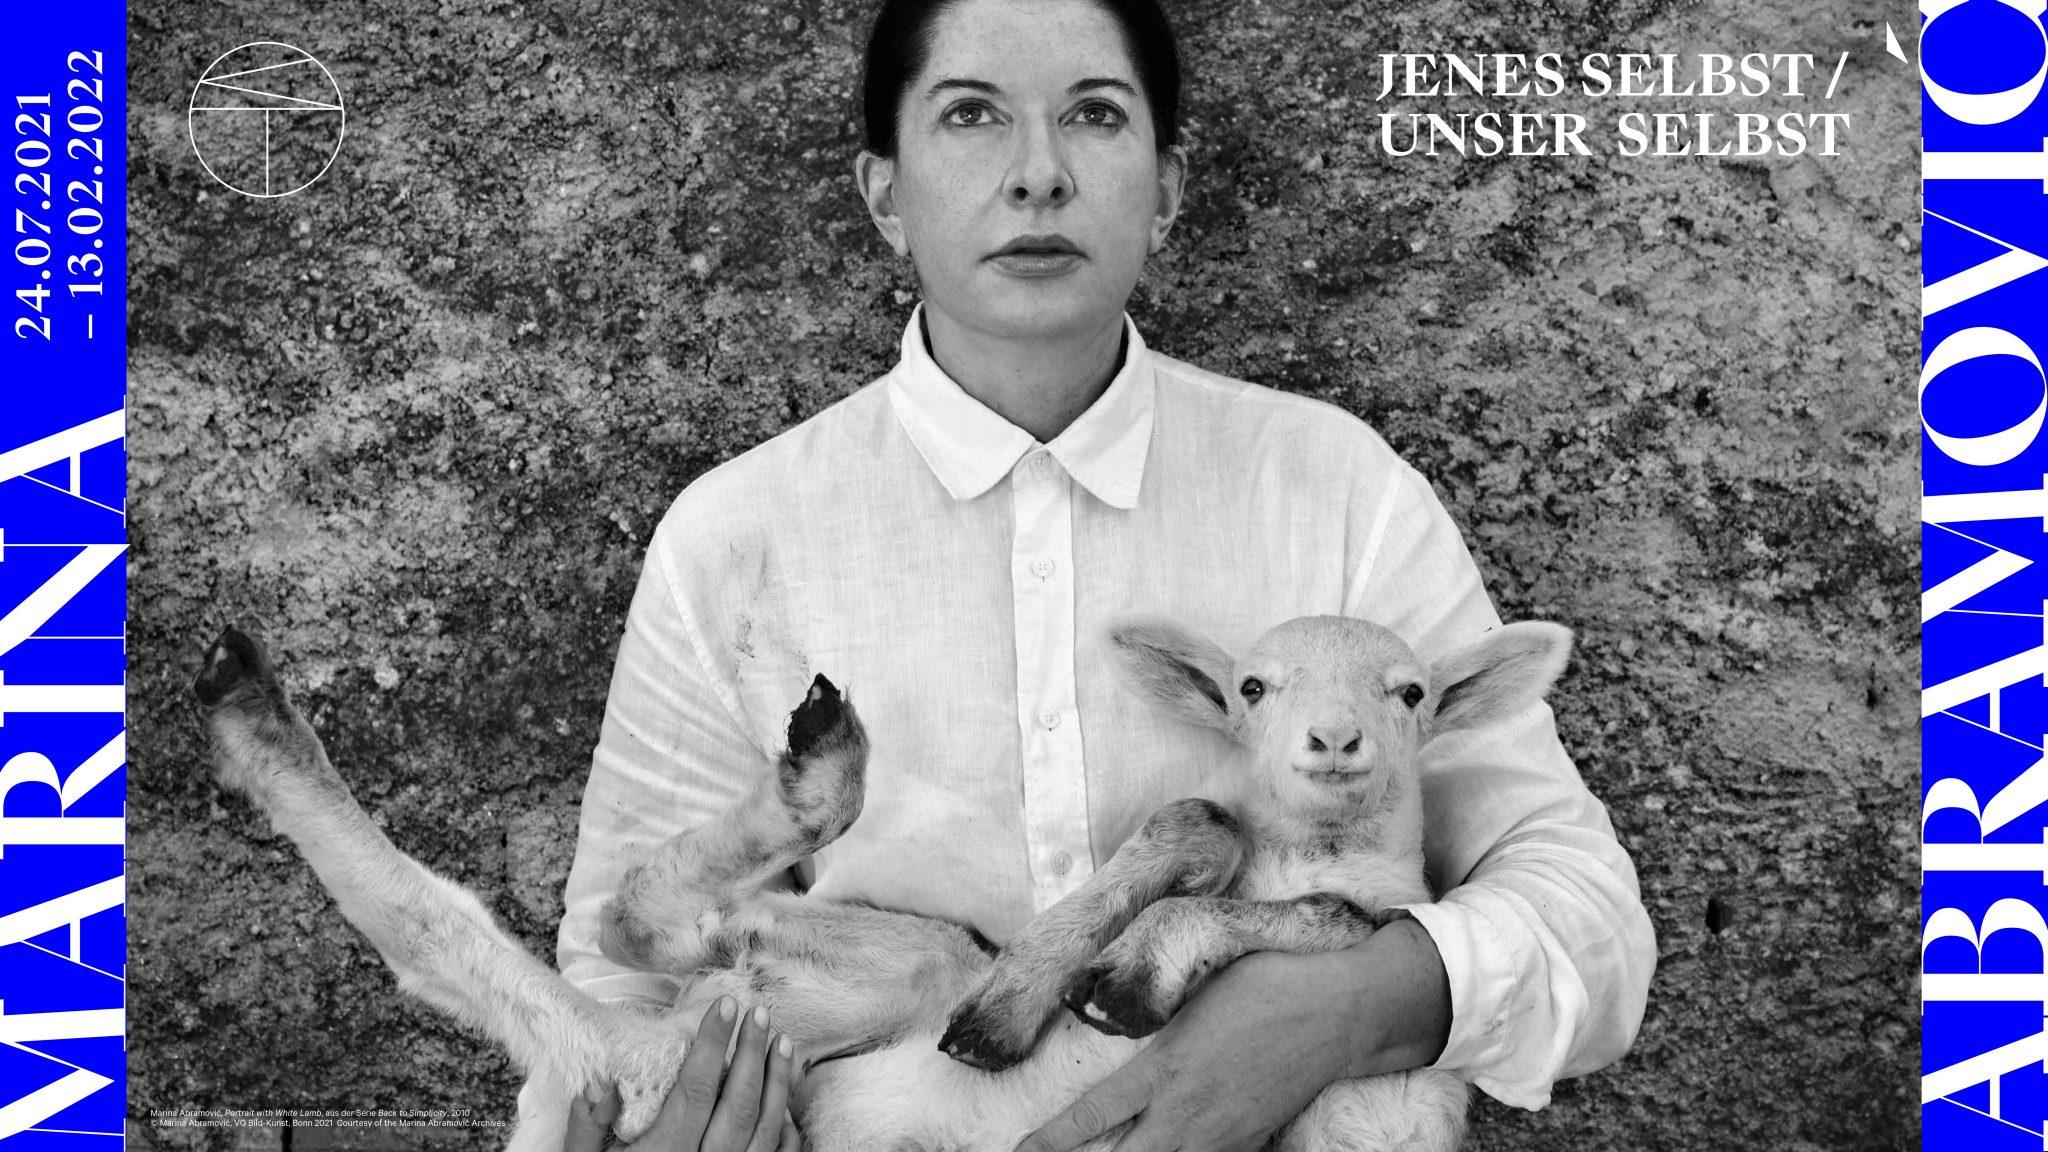 Marina Abramović  Portrait with White Lamb Aus der Serie Back to Simplicity Farbpigmentdruck 2010 © Marina Abramović, VG Bild-Kunst, Bonn 2021 Courtesy of the Marina Abramović Archives